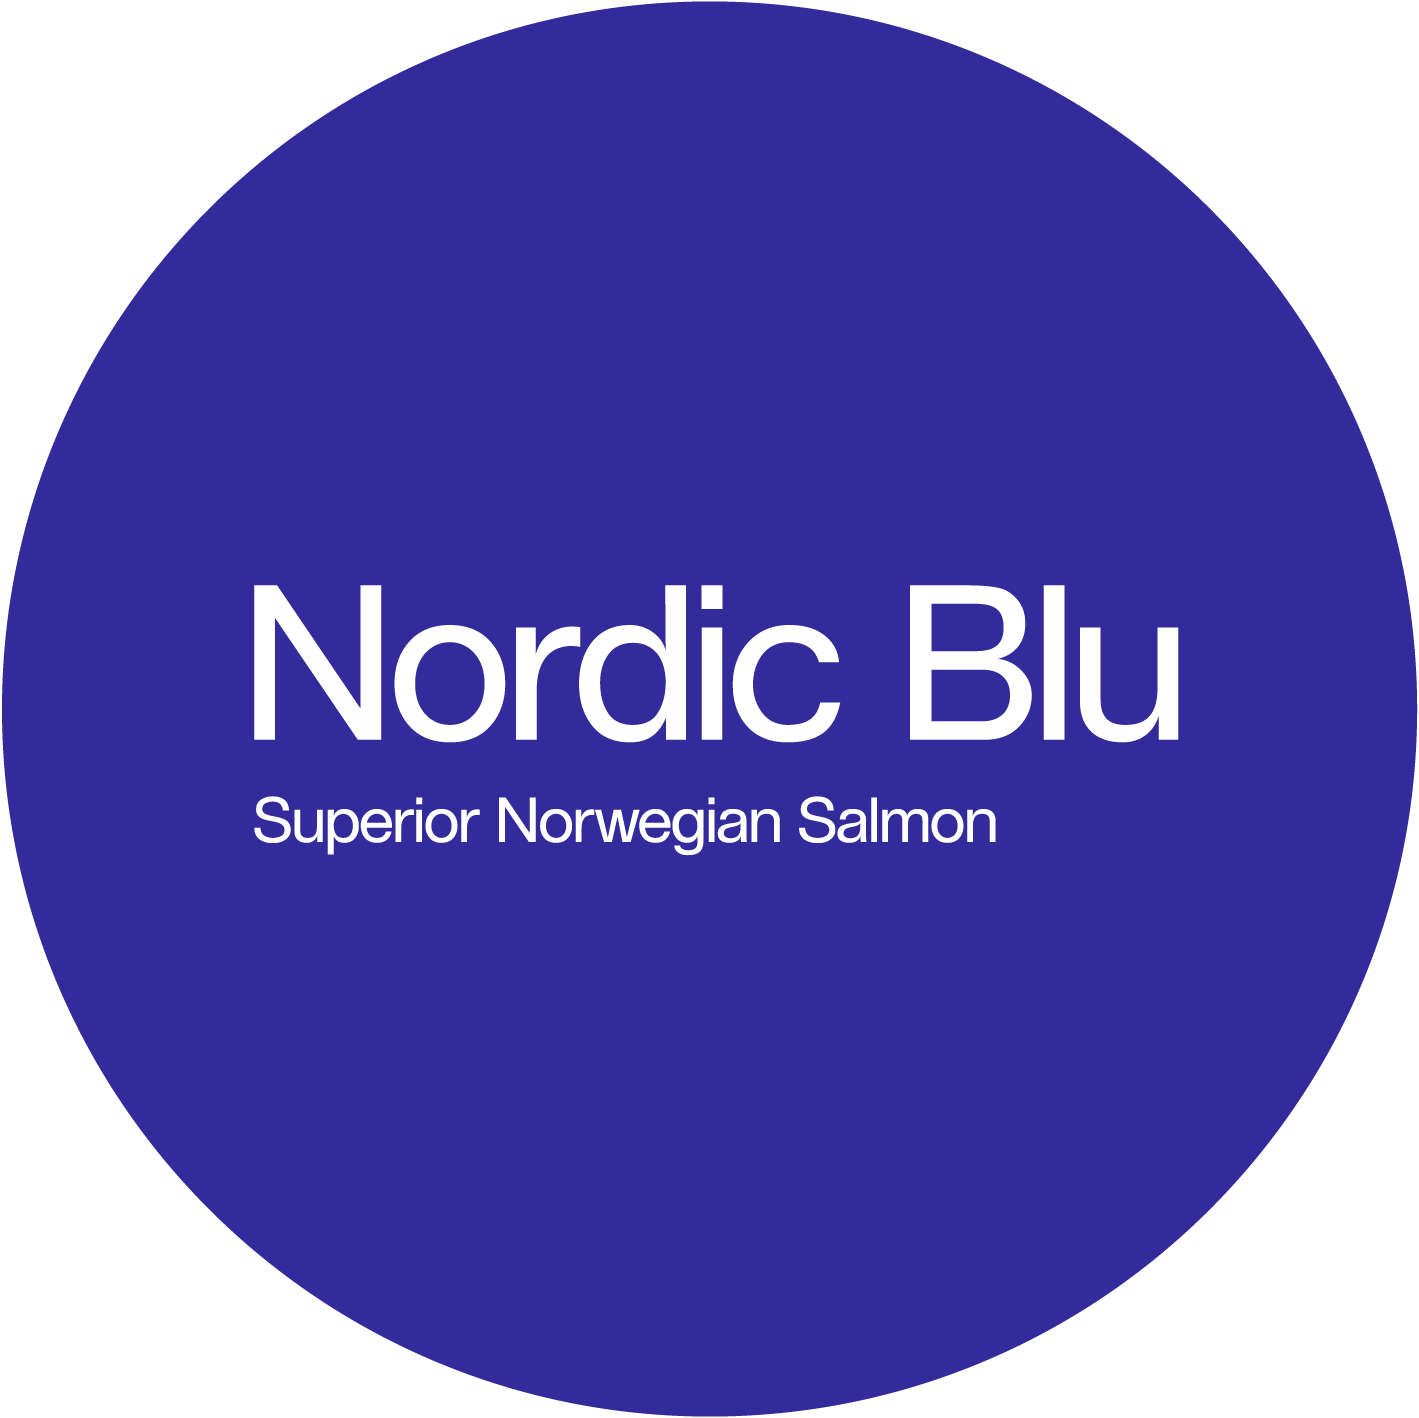 Nordic 12cm cirkel